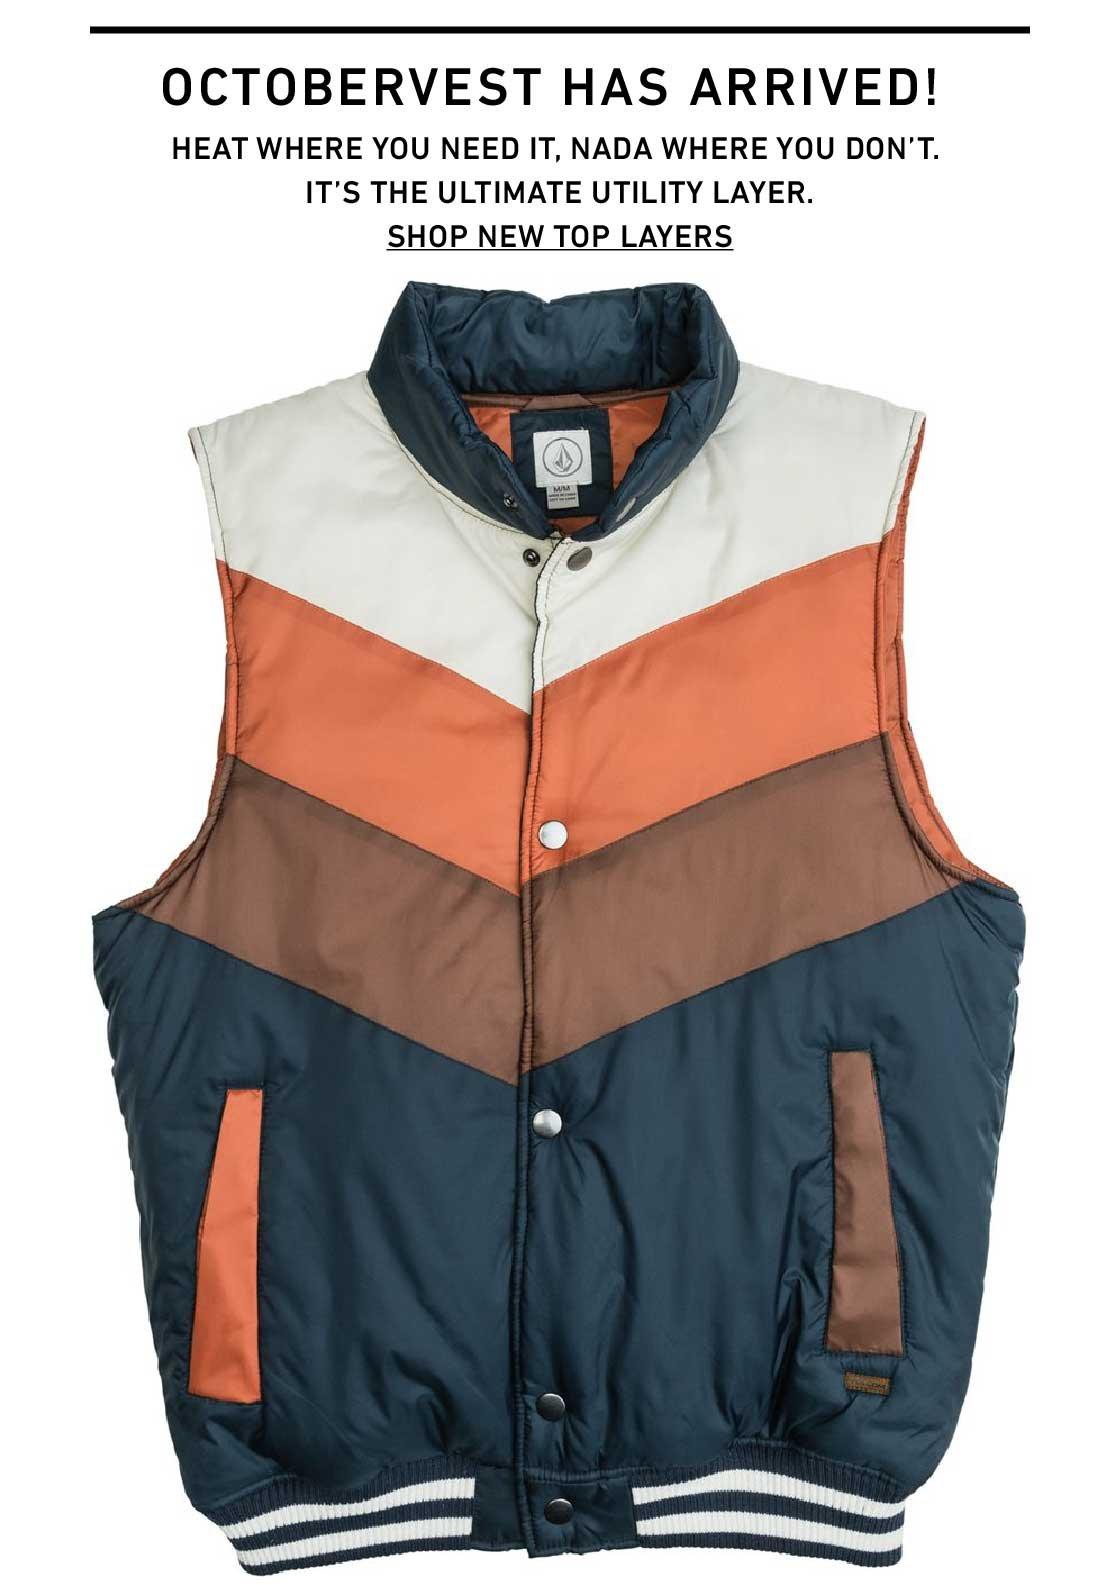 Happy OctoberVest! Shop New Vests and Jackets.